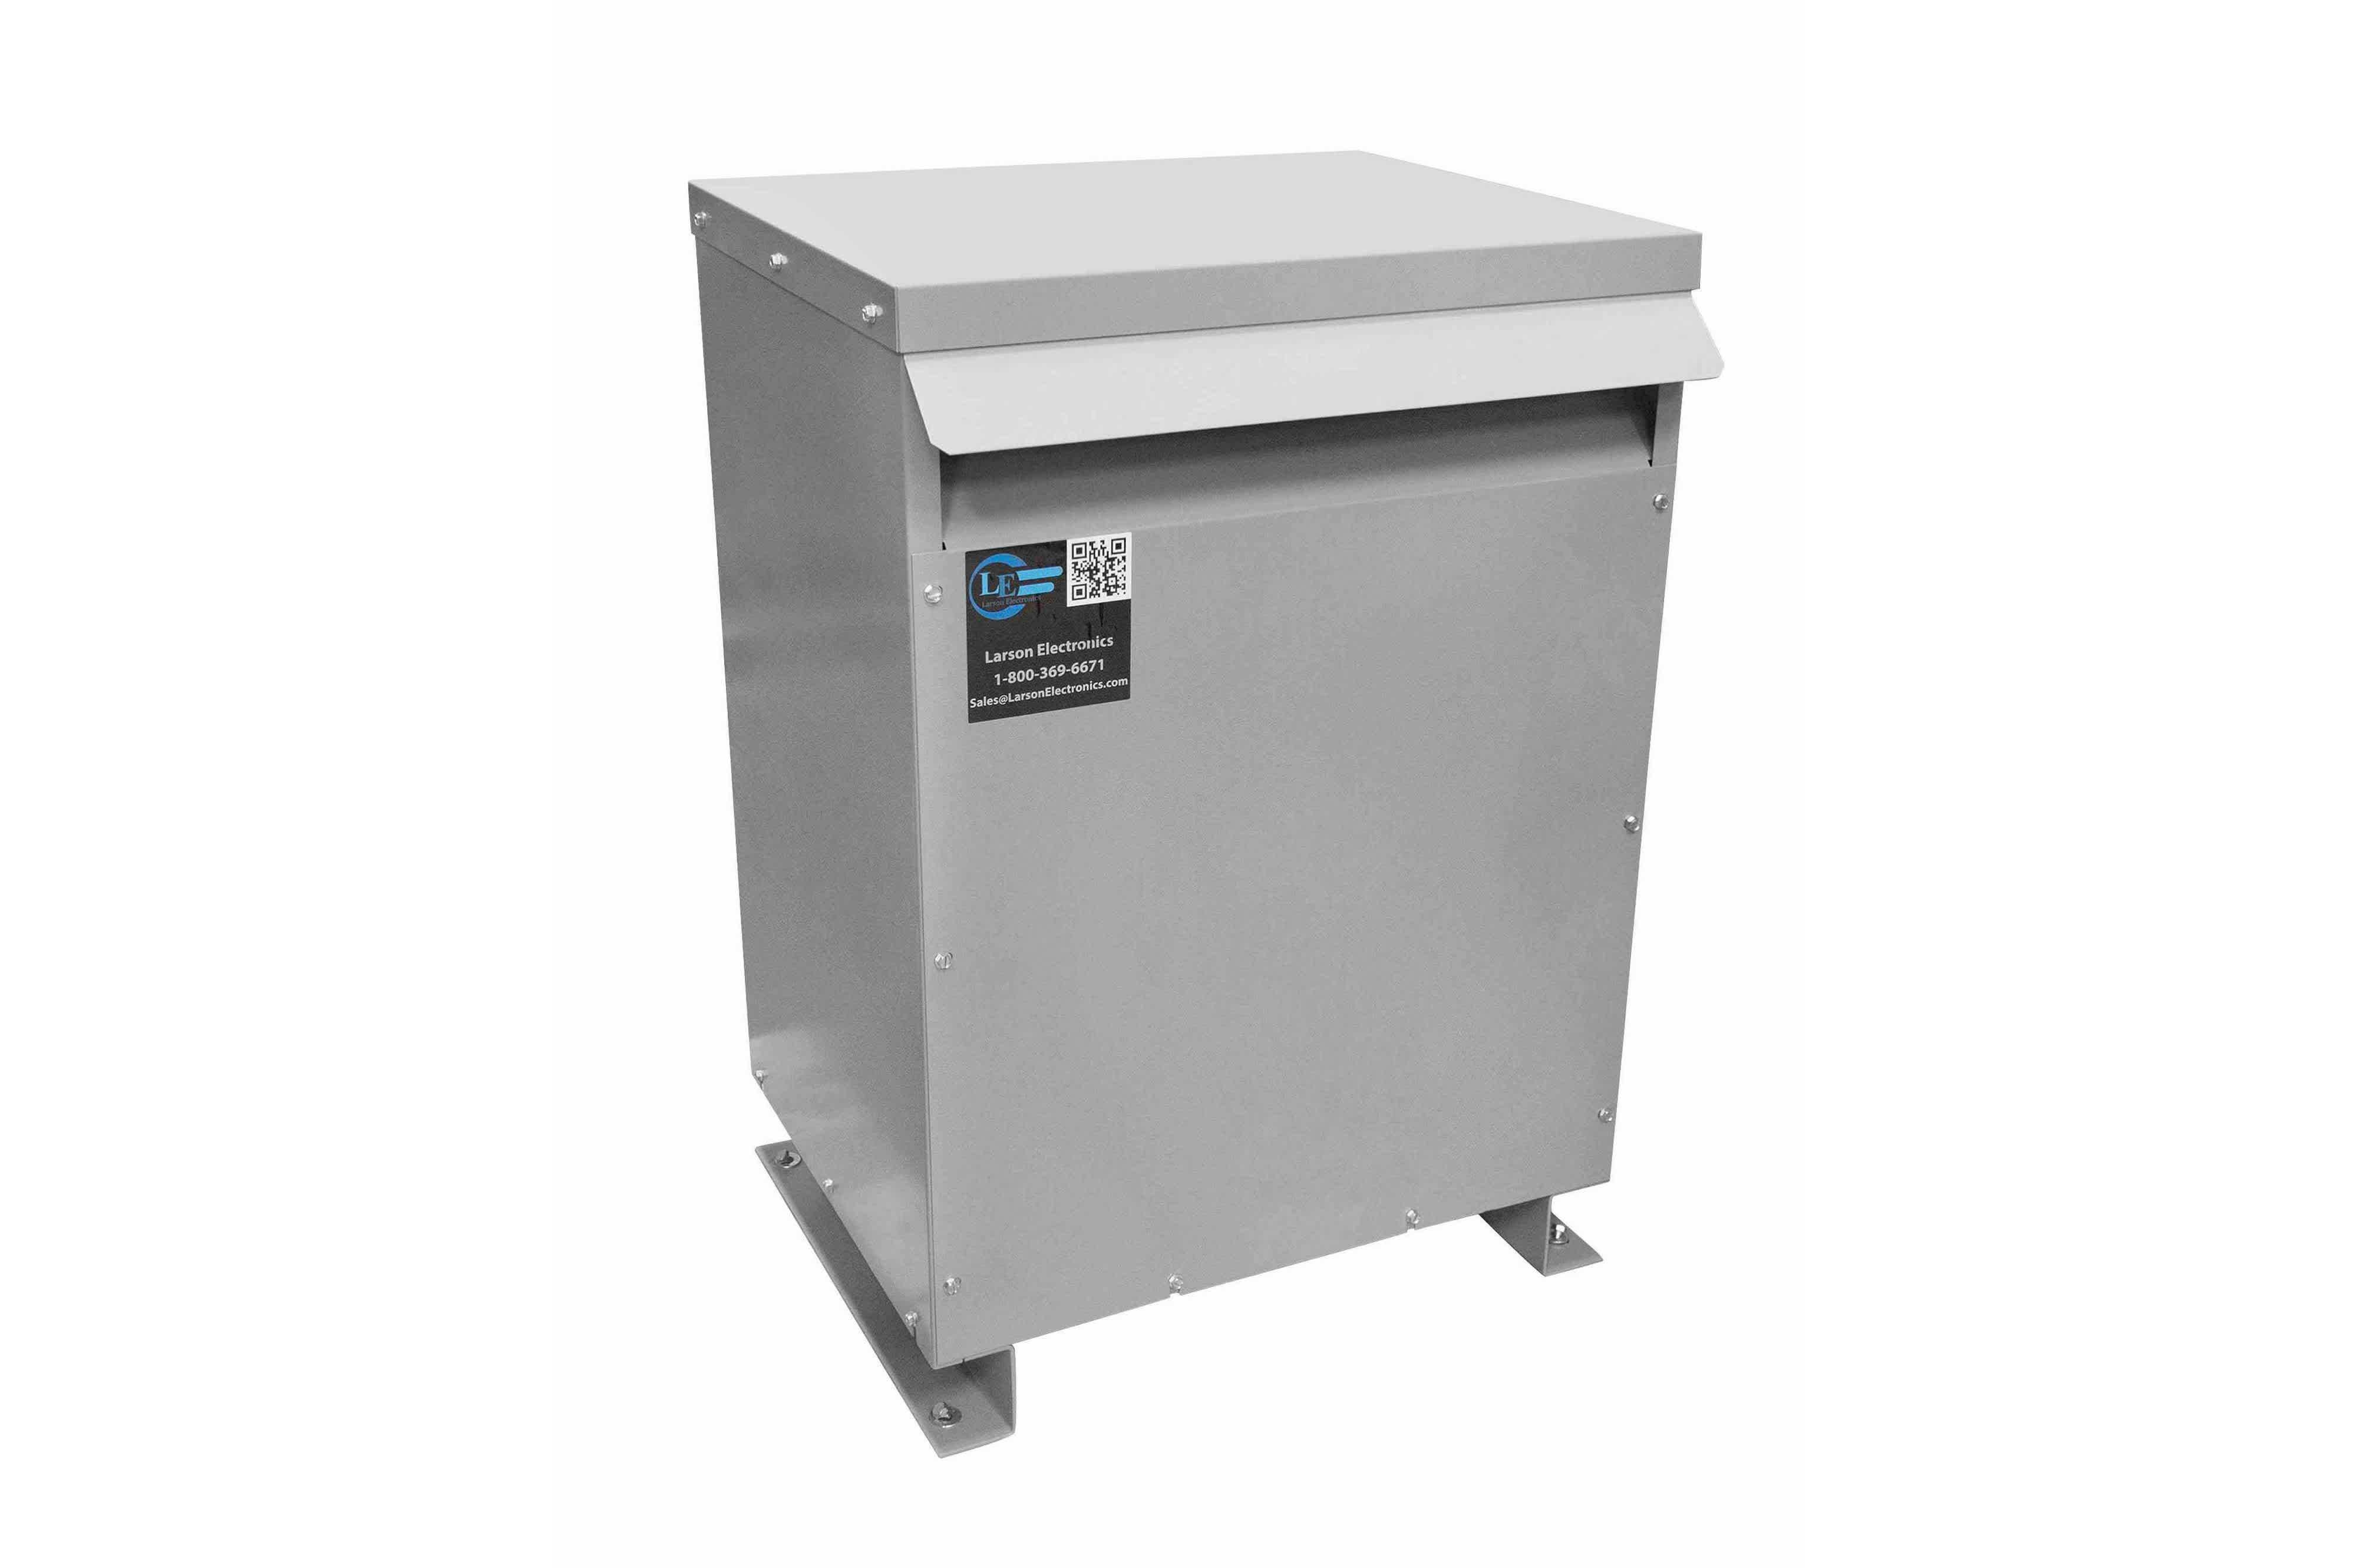 50 kVA 3PH DOE Transformer, 415V Delta Primary, 208Y/120 Wye-N Secondary, N3R, Ventilated, 60 Hz